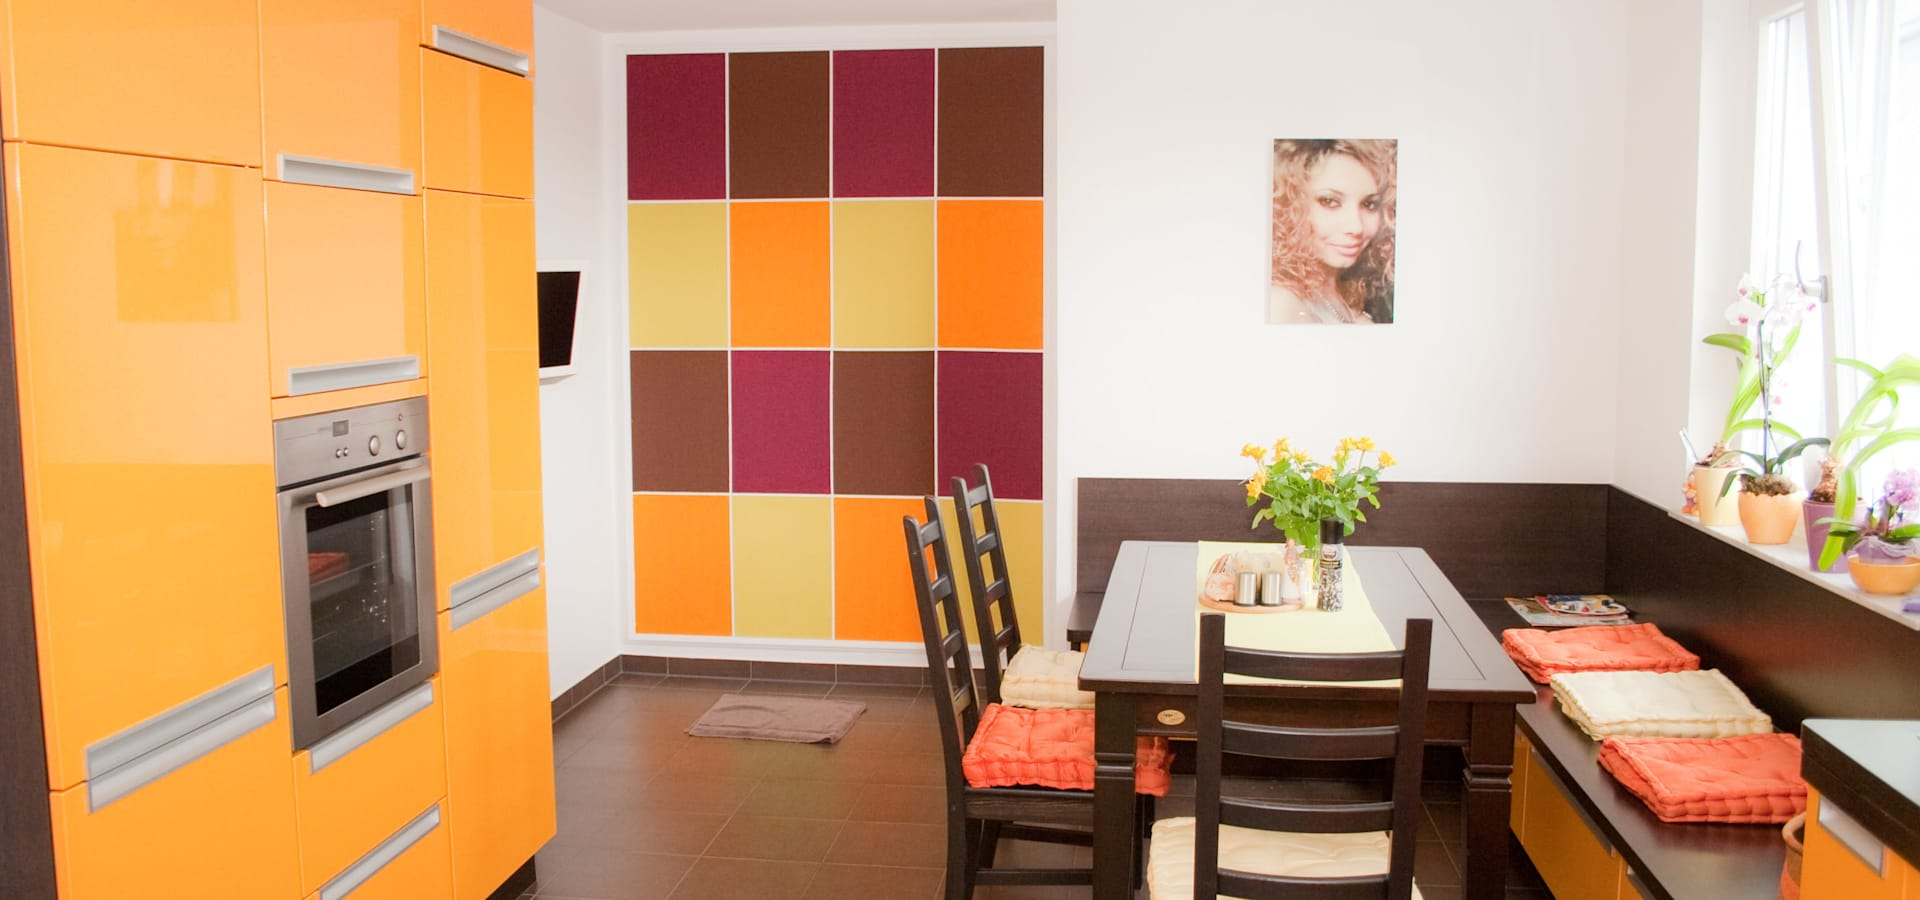 Hoffmann Immobilienpräsentation Home Staging & Redesign UG (hfb.)